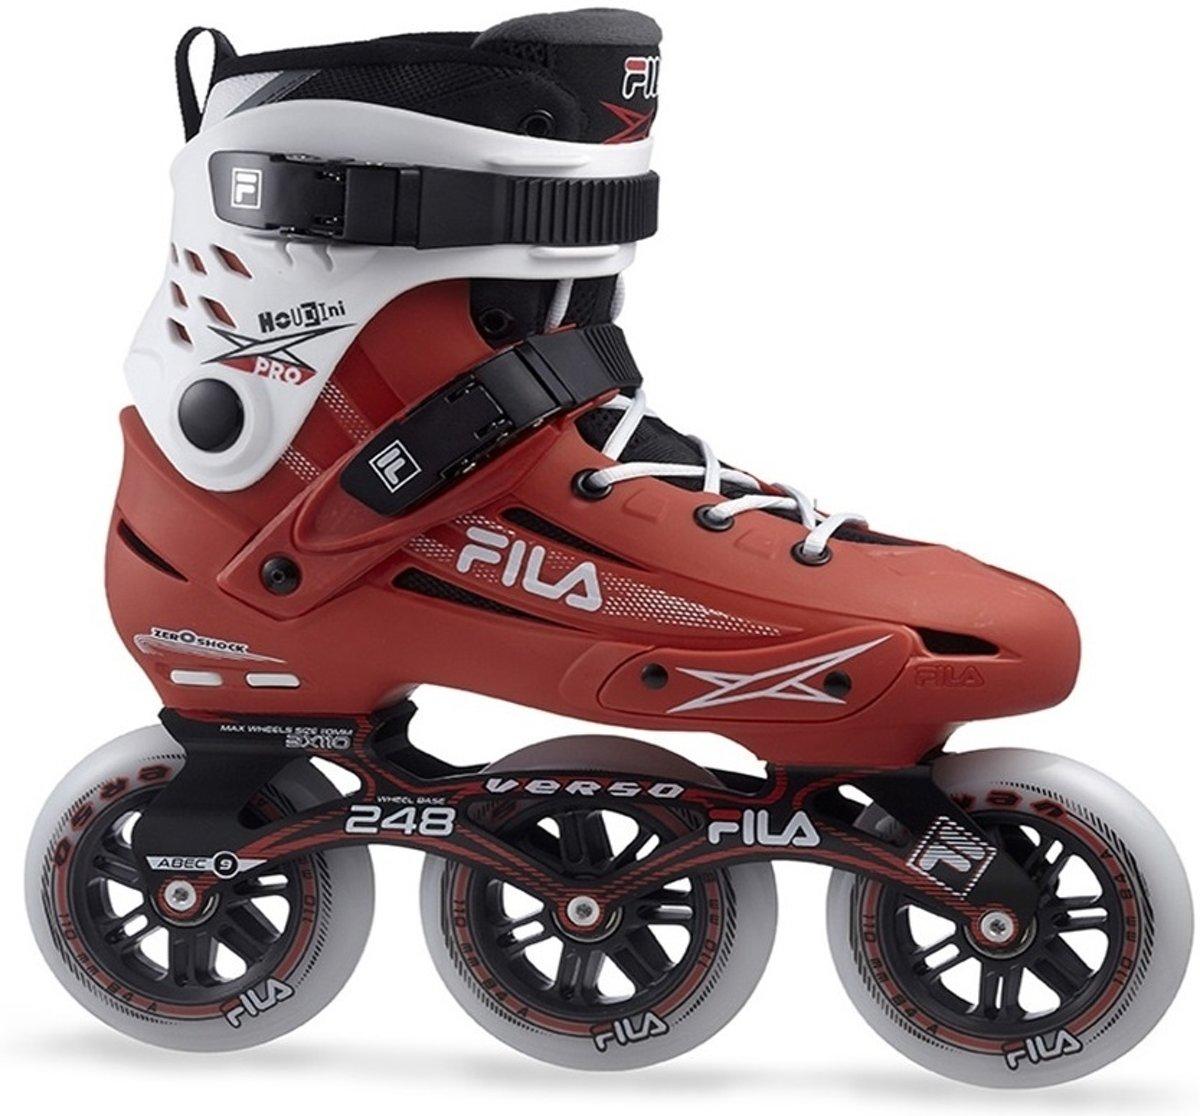 Afbeelding van product FILA INLINE SKATES, HOUDINI PRO 110  - maat 45.5